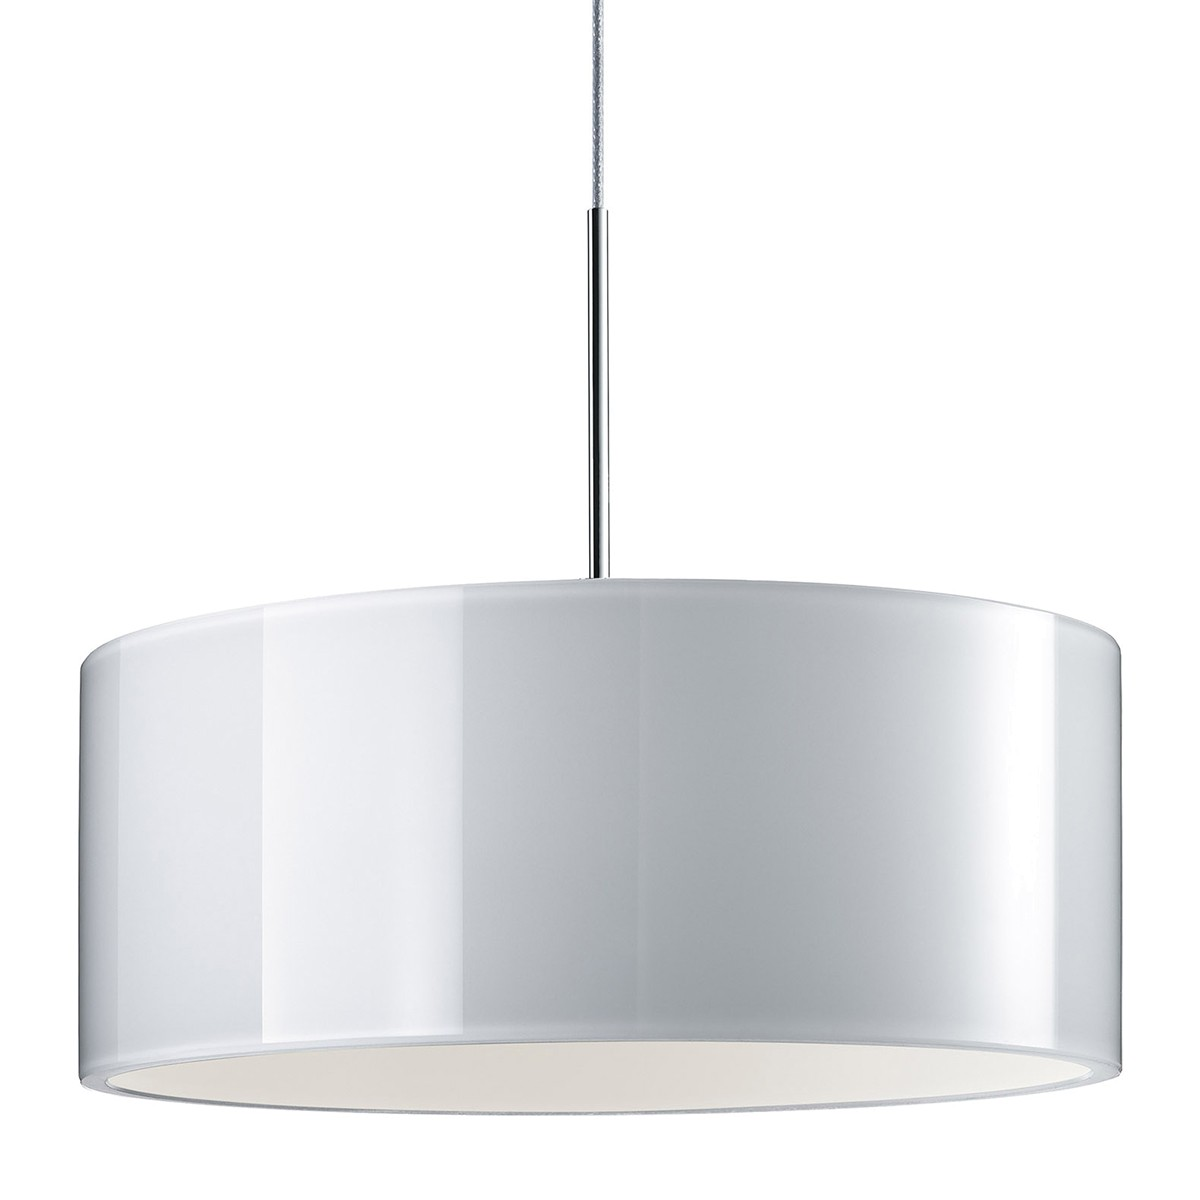 Bruck Duolare Cantara Glas Chrom Ø: 30 cm, LED Pendelleuchte, weiß